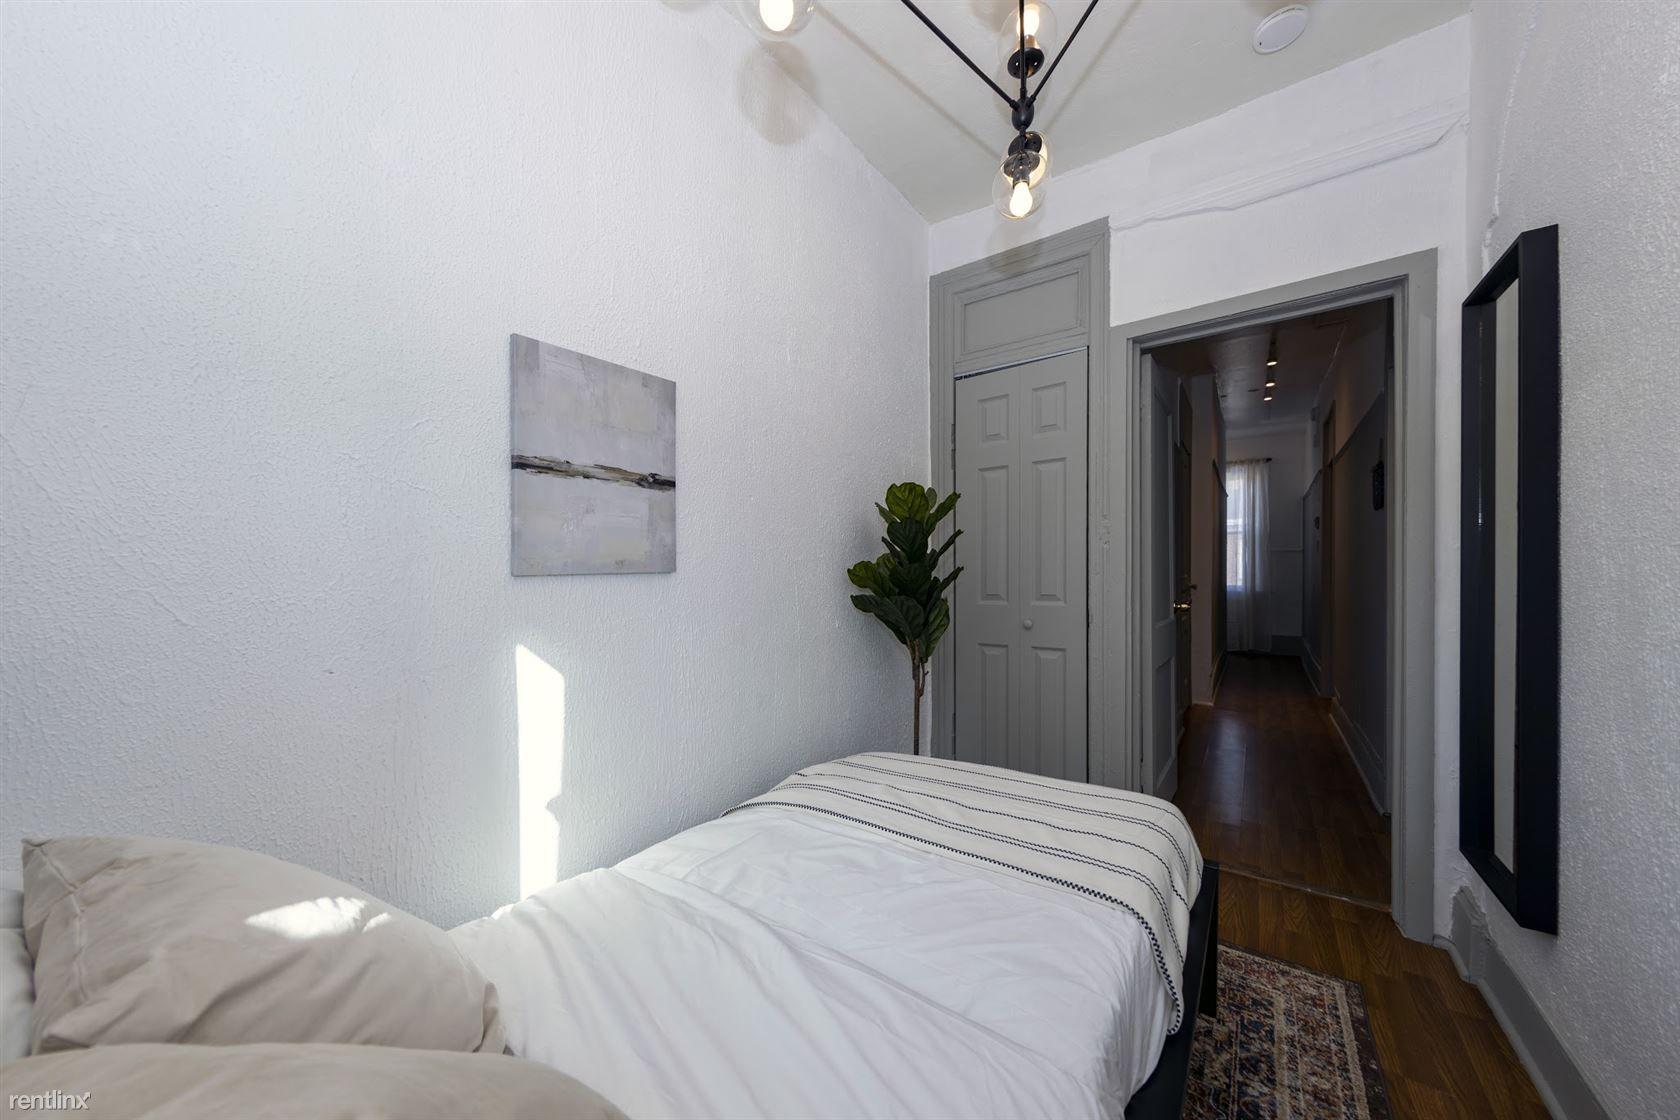 611 Florida Avenue, Washington DC, DC, 20001 for rent